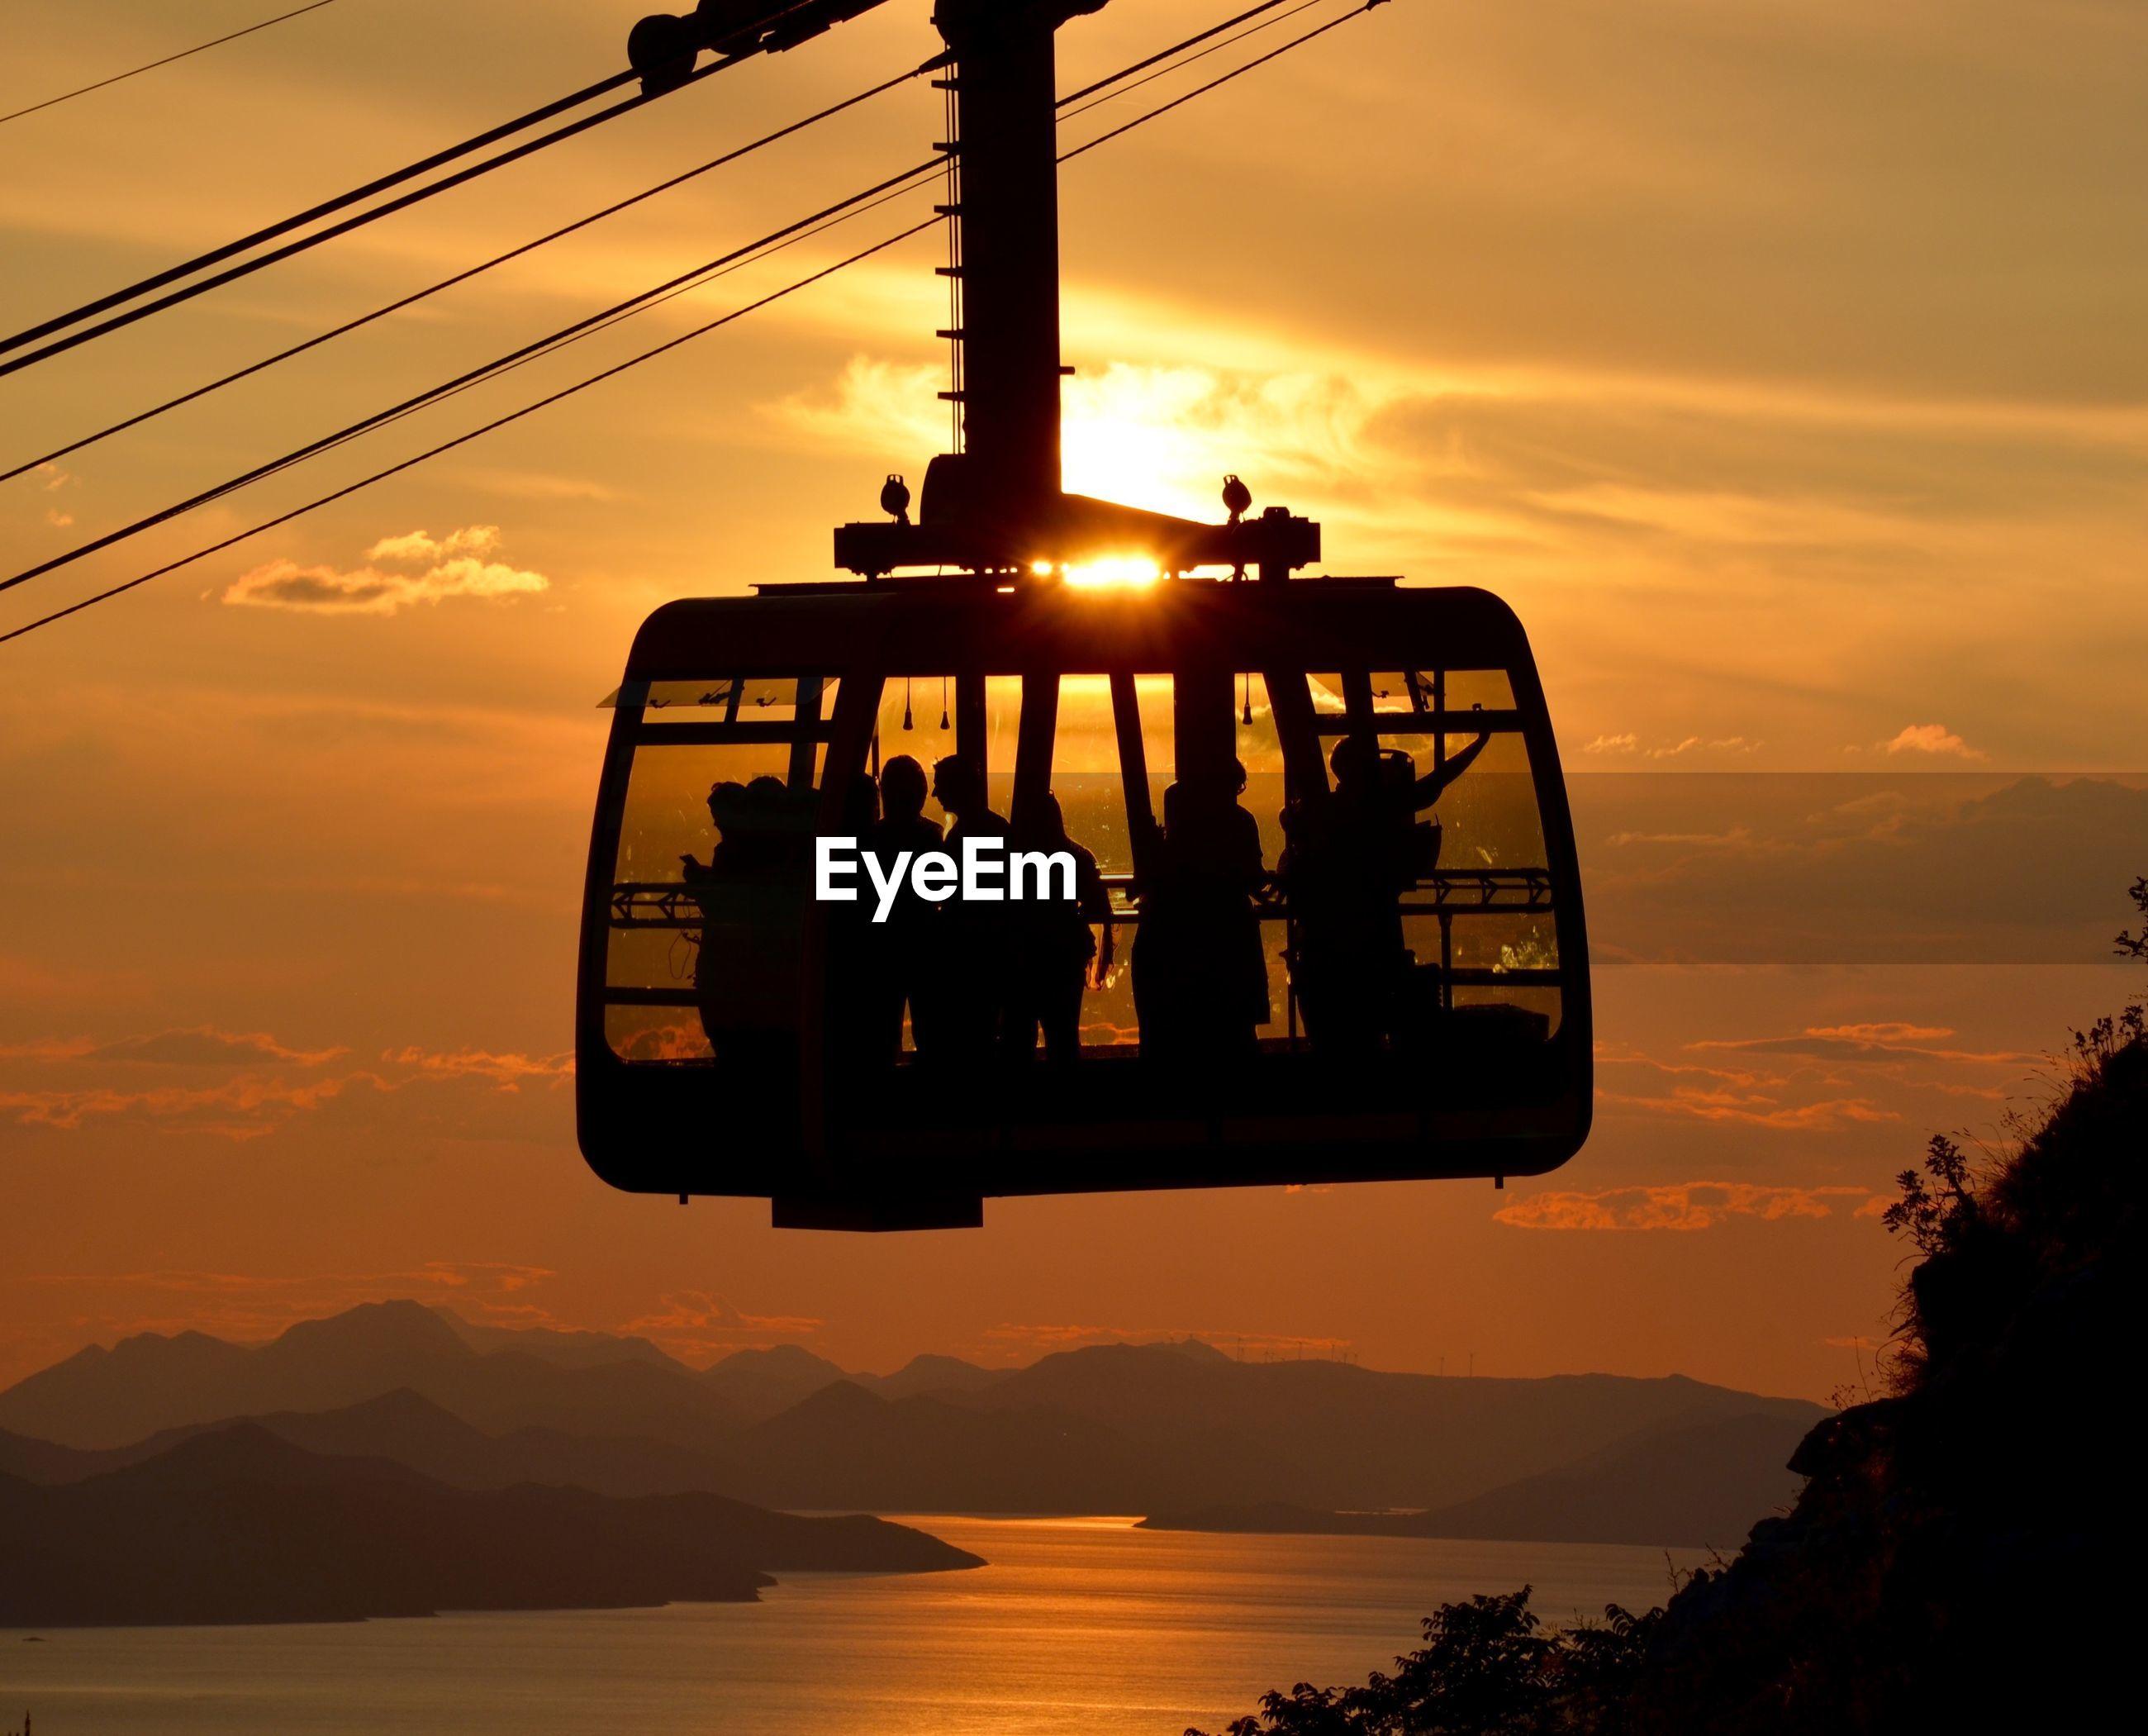 Silhouette people in ferries wheel cabin against sunset